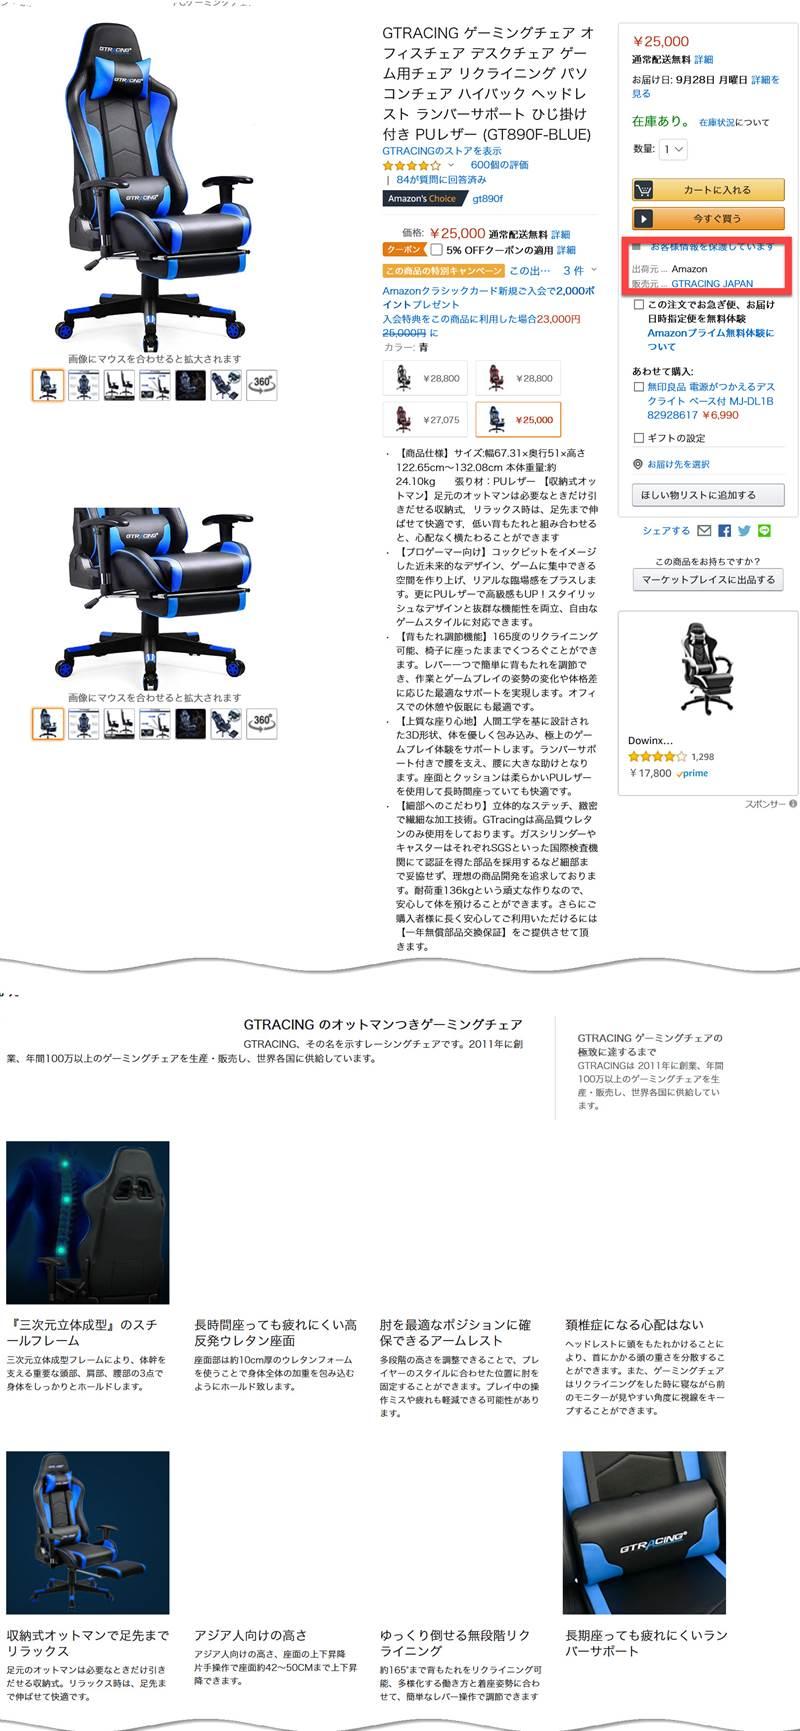 GTRACING GT890F ゲーミングチェア青が格安!